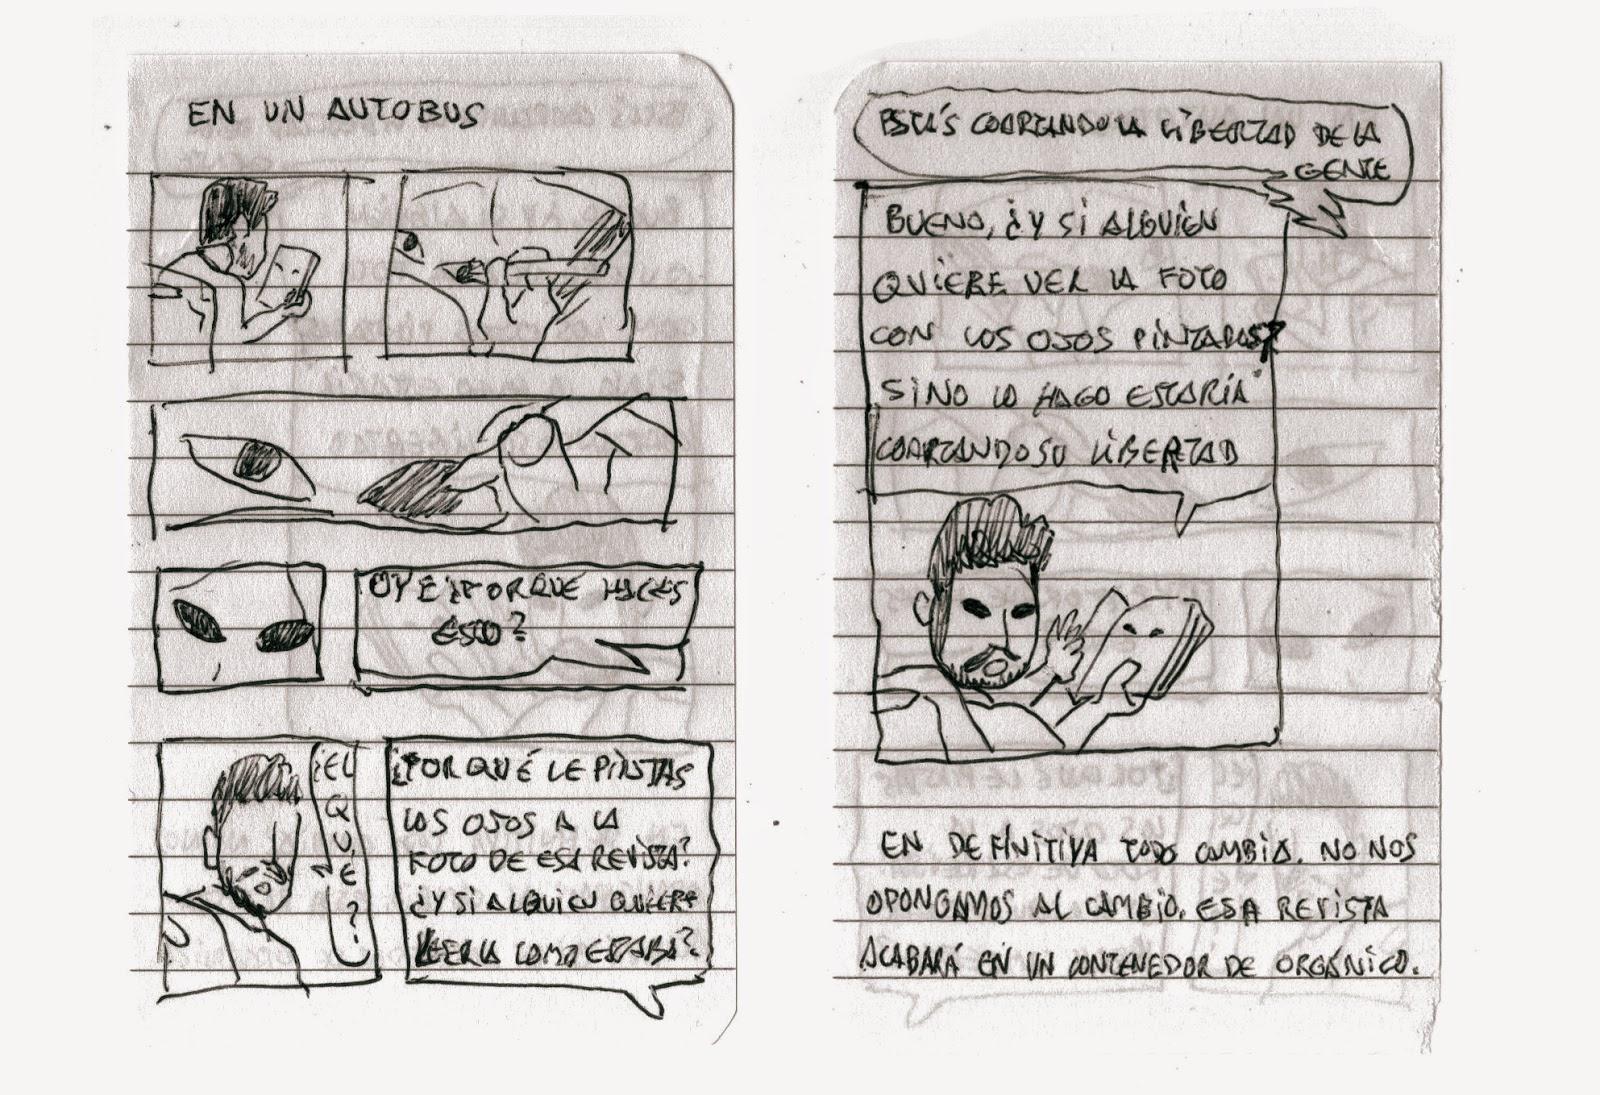 http://ncordobadelgado.blogspot.com.es/2012/11/ilustracion_2584.html